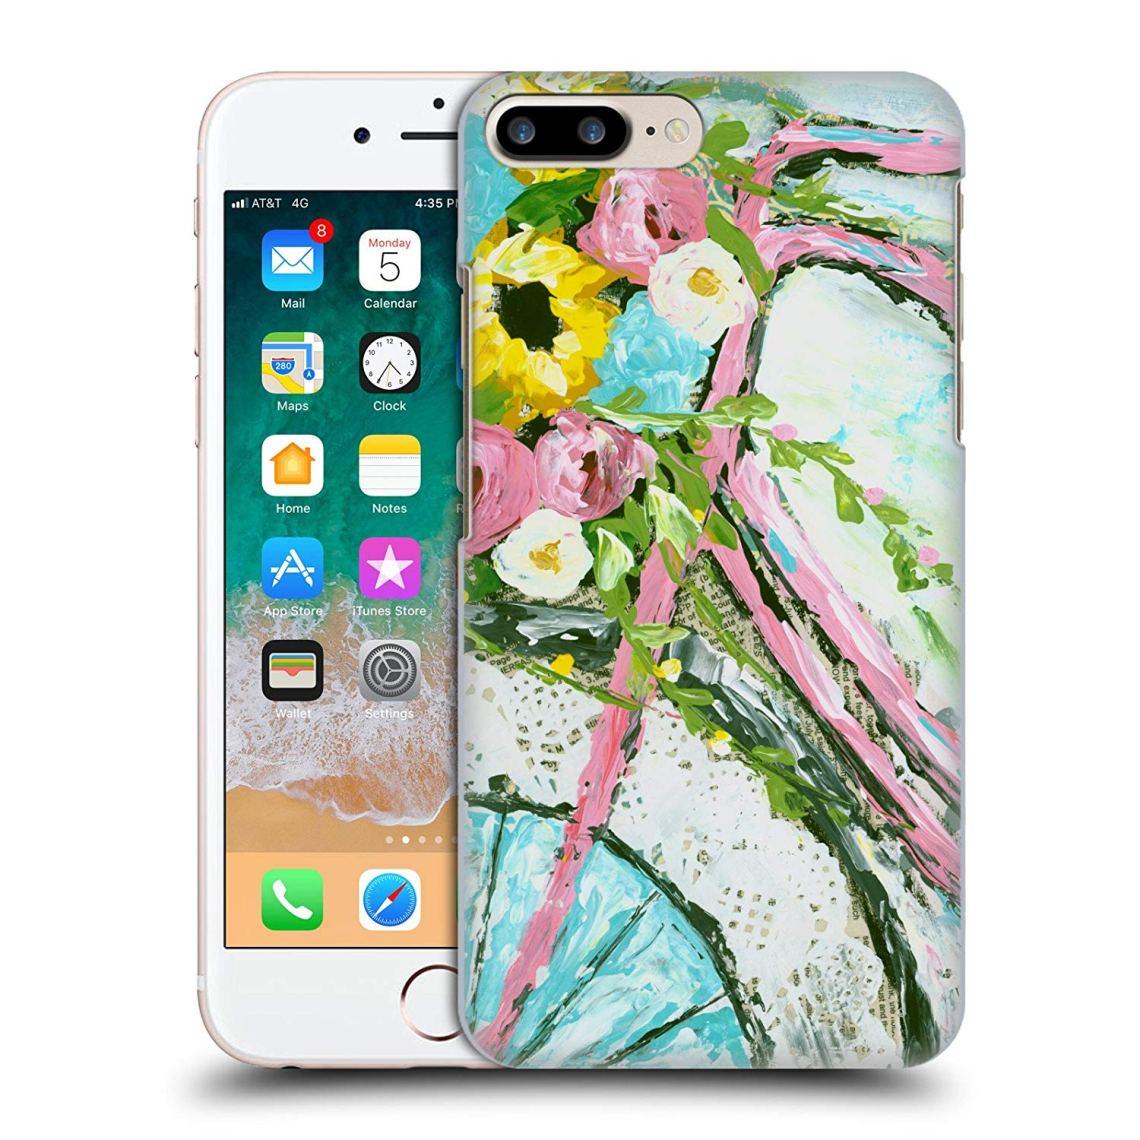 iPhone Case Amanda Hilburn design